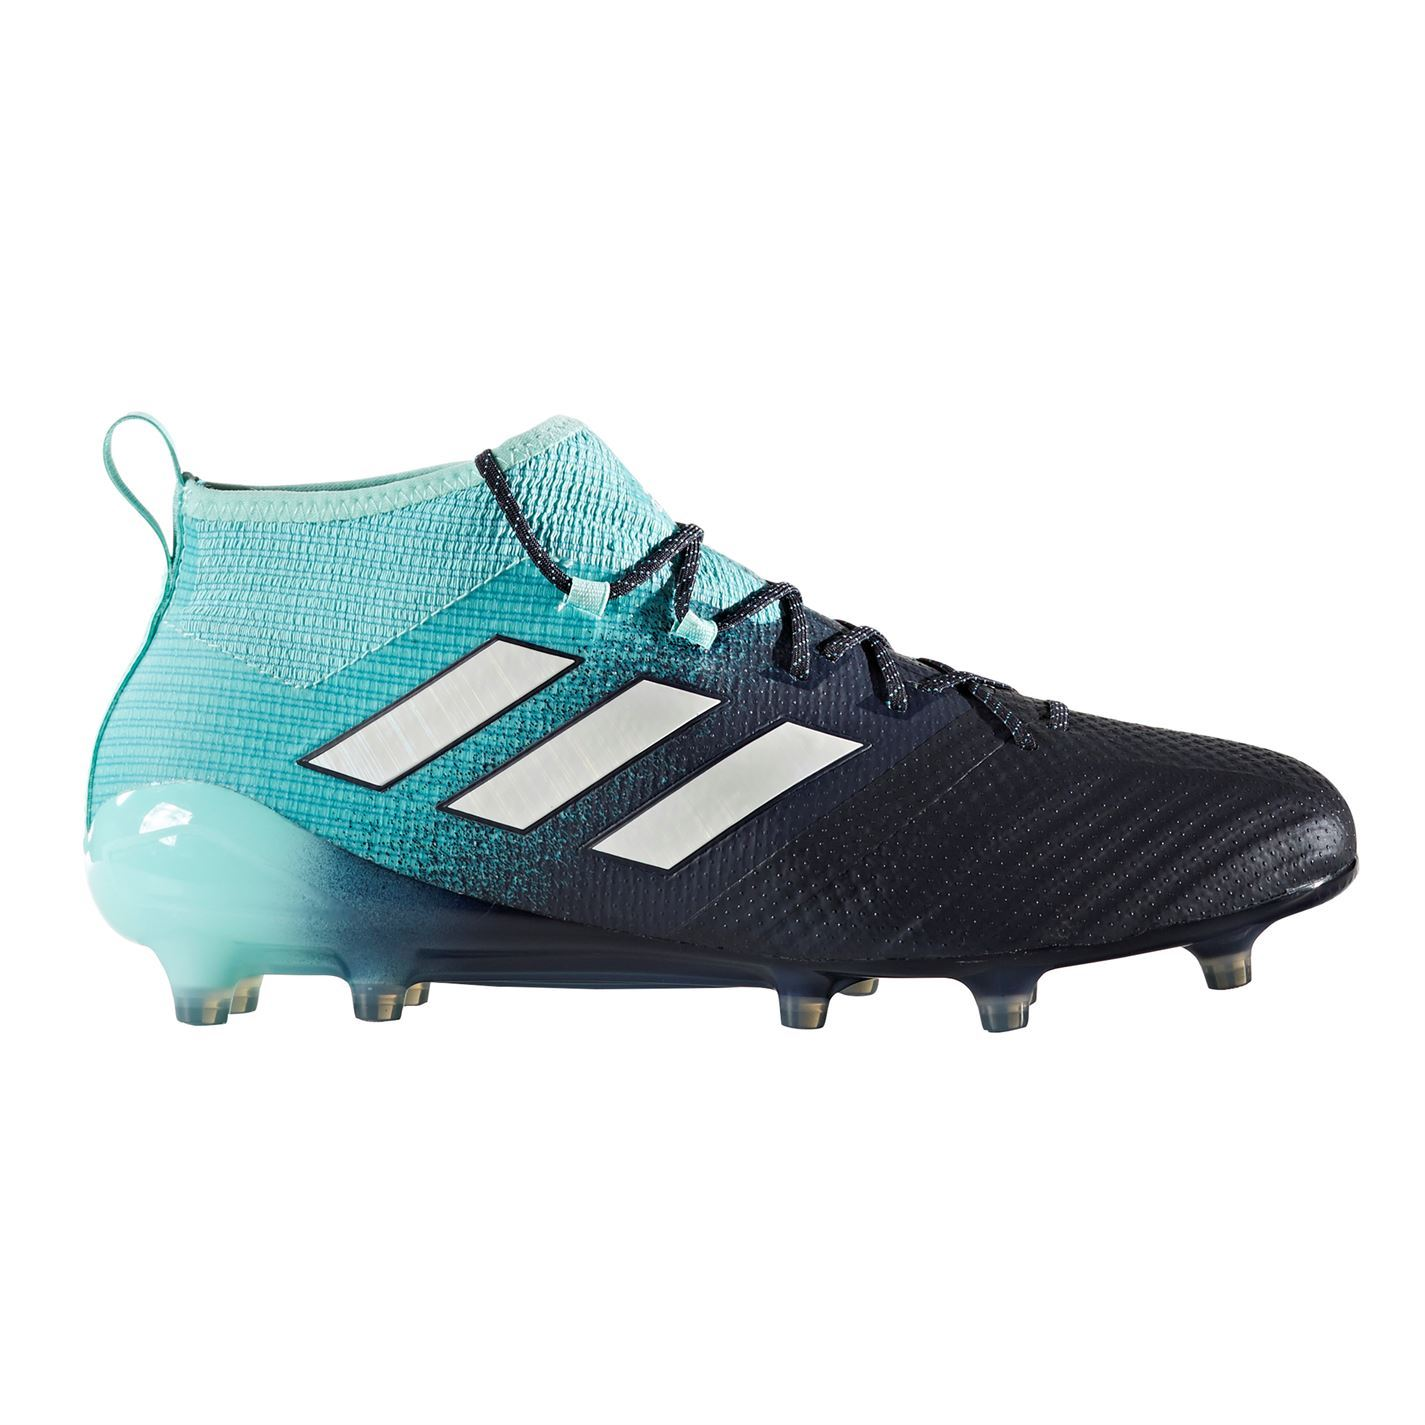 sale retailer 365a7 86226 adidas Mens Ace 17.1 Primeknit FG Football Boots Firm Ground Lace Up  Lightweight